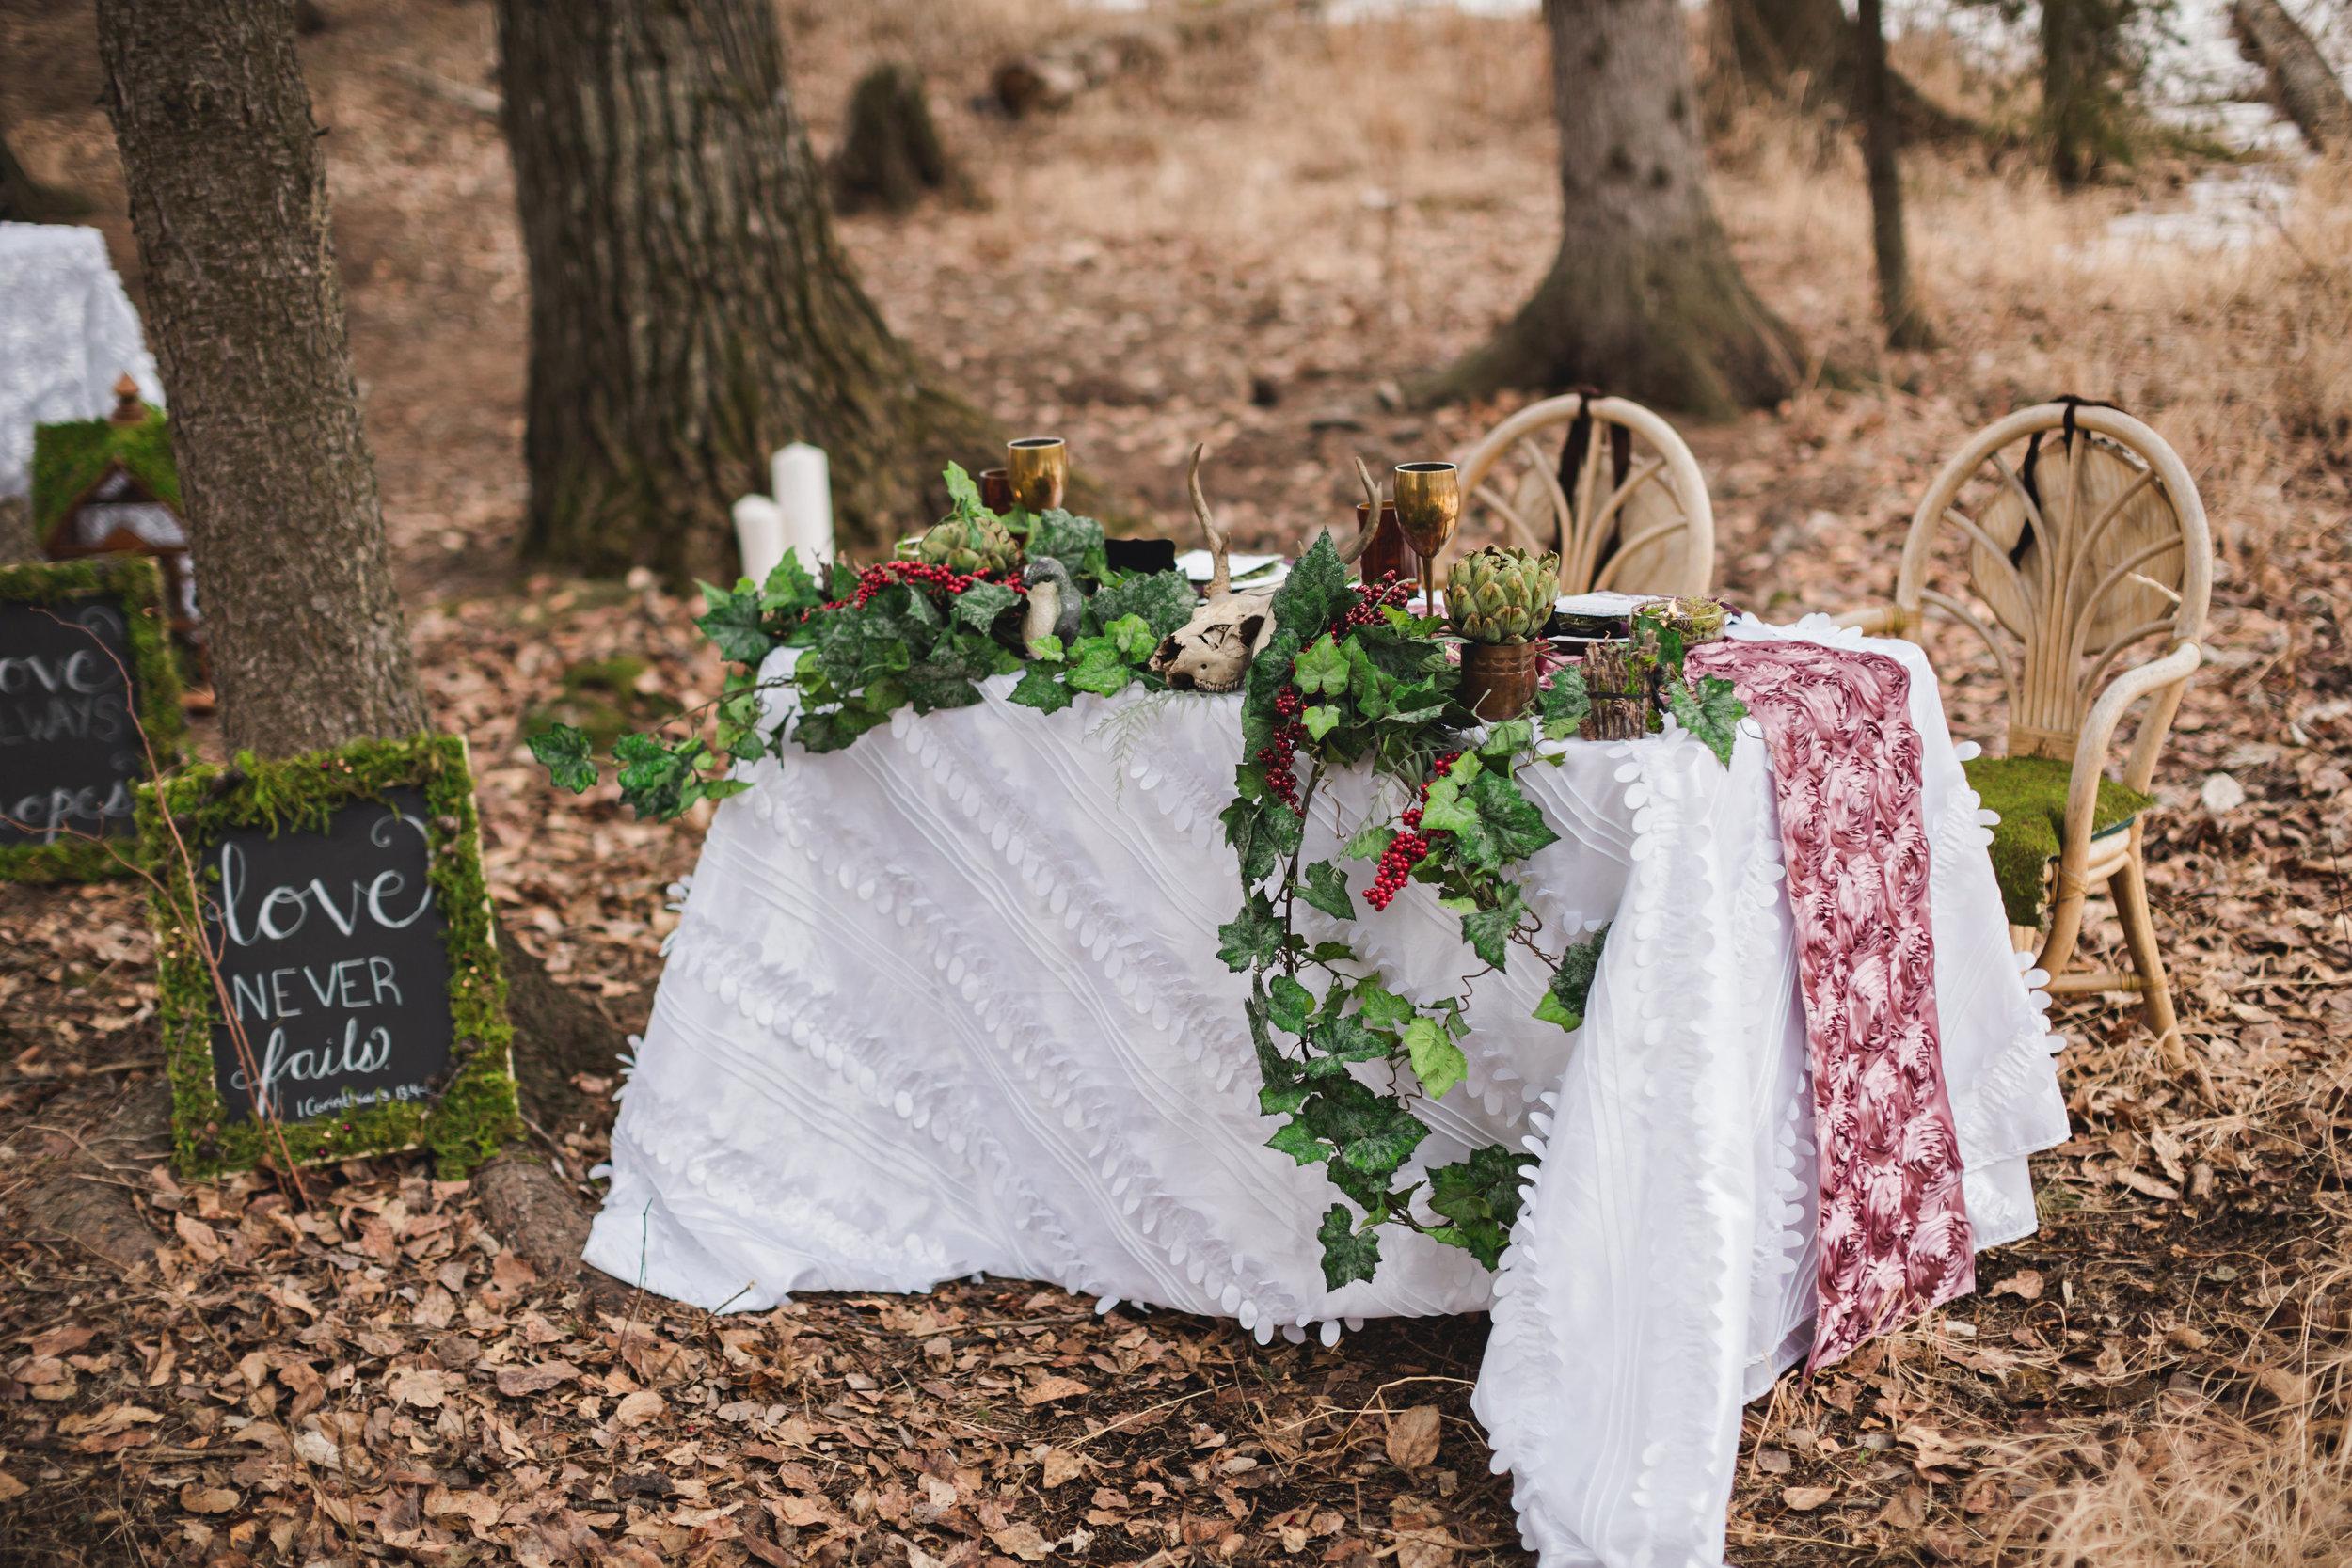 Snow White & Huntsman Concept Photo Shoot